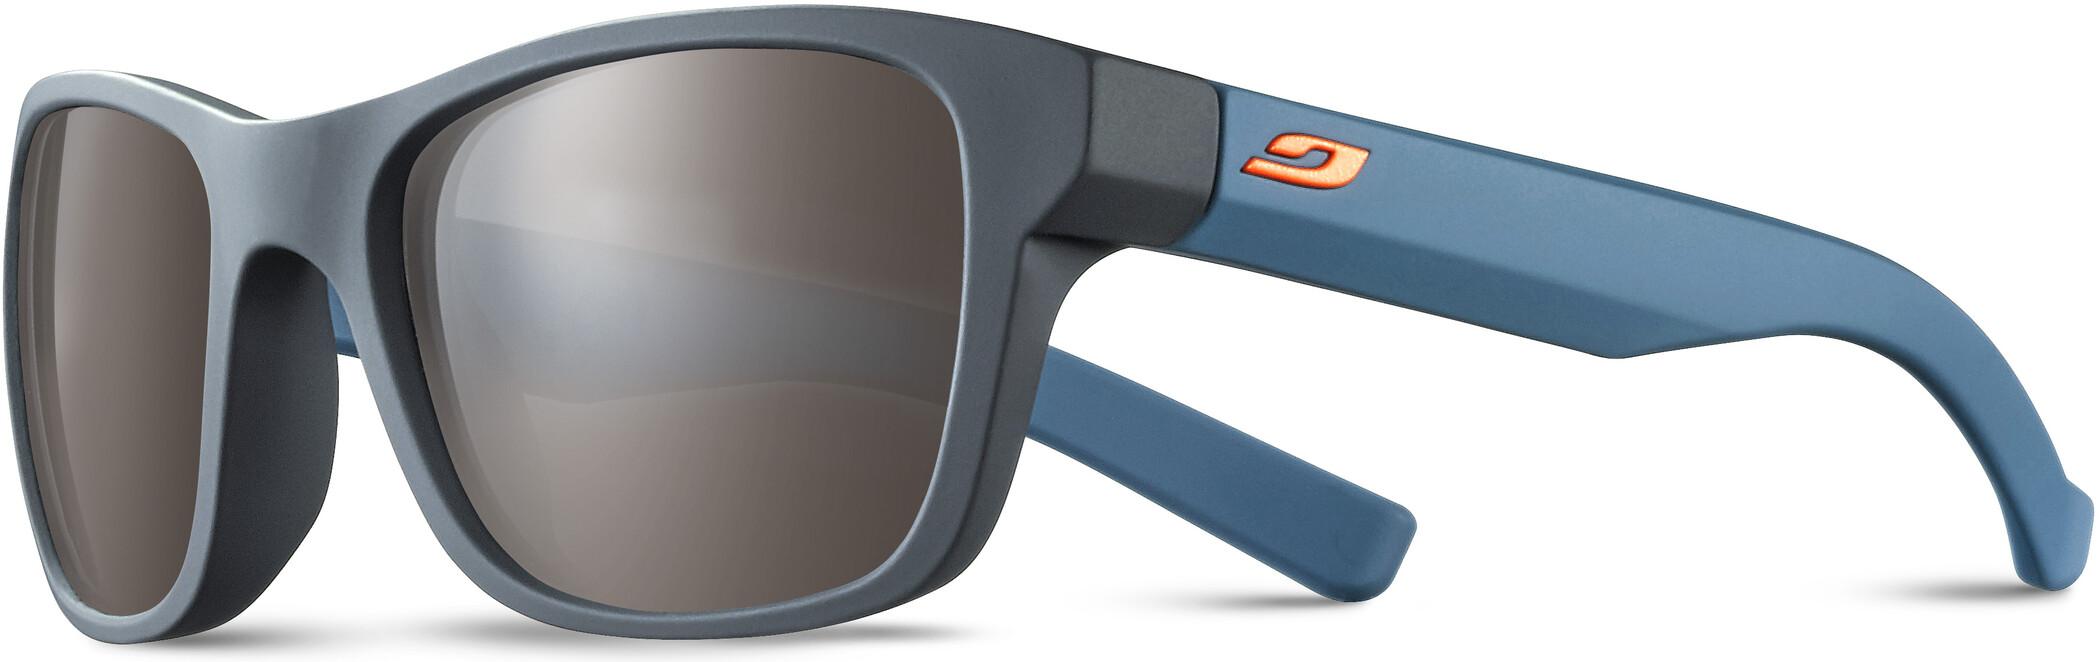 Julbo Reach Spectron 3 Solbriller Børn, dark gray/blue | Briller